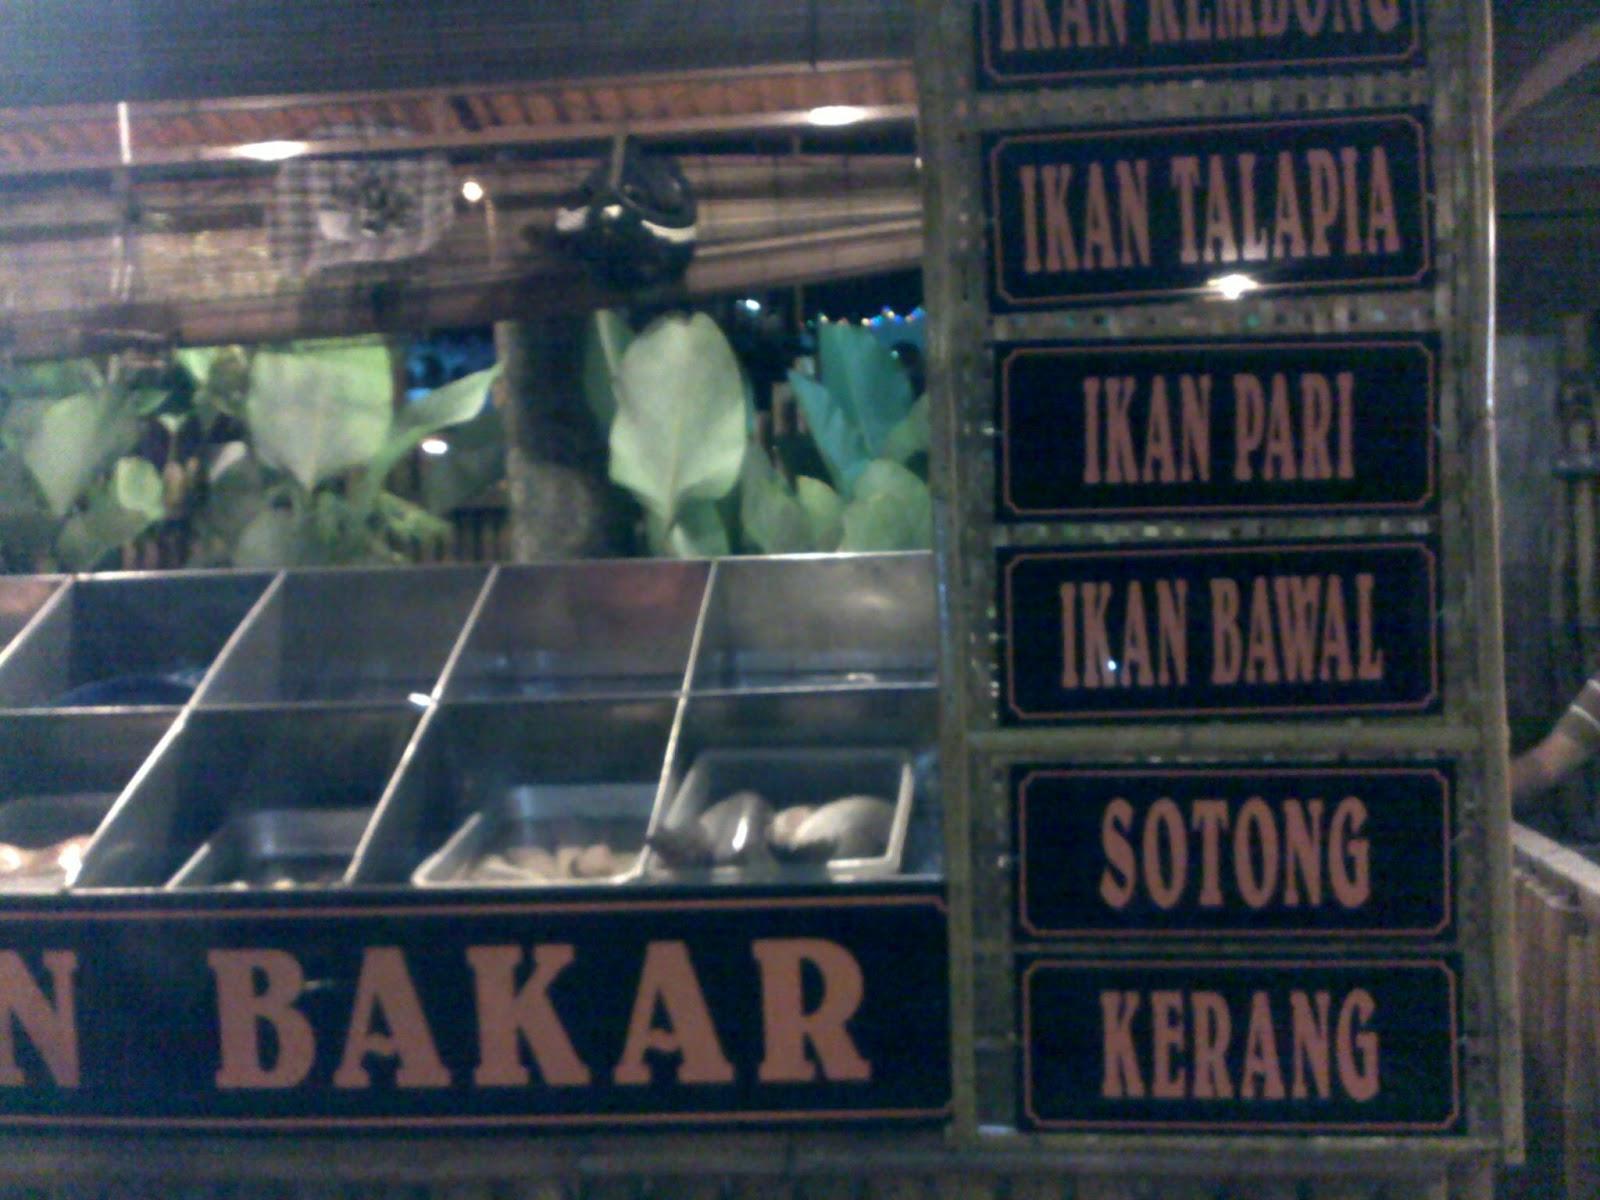 Restoran D Dapur Ibuku Menyediakan Masakan Melayu Ala Siam Makanan Laut Western Dan Keistimewaannya Ialah Nasi Goreng